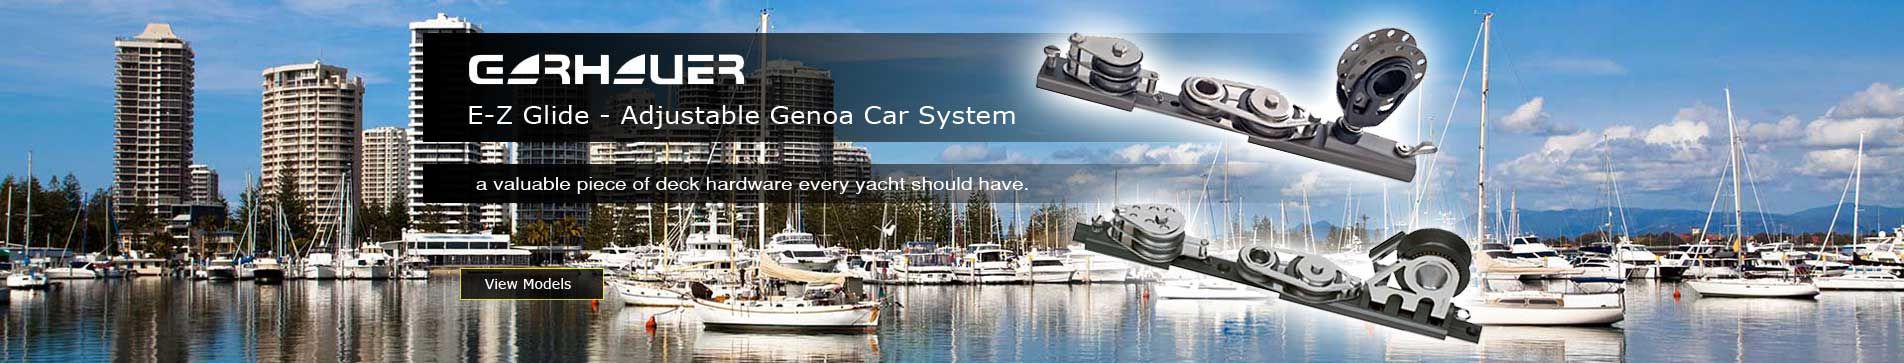 Garhauer - EZ-Glide Adjustable Genoa CarSyatem